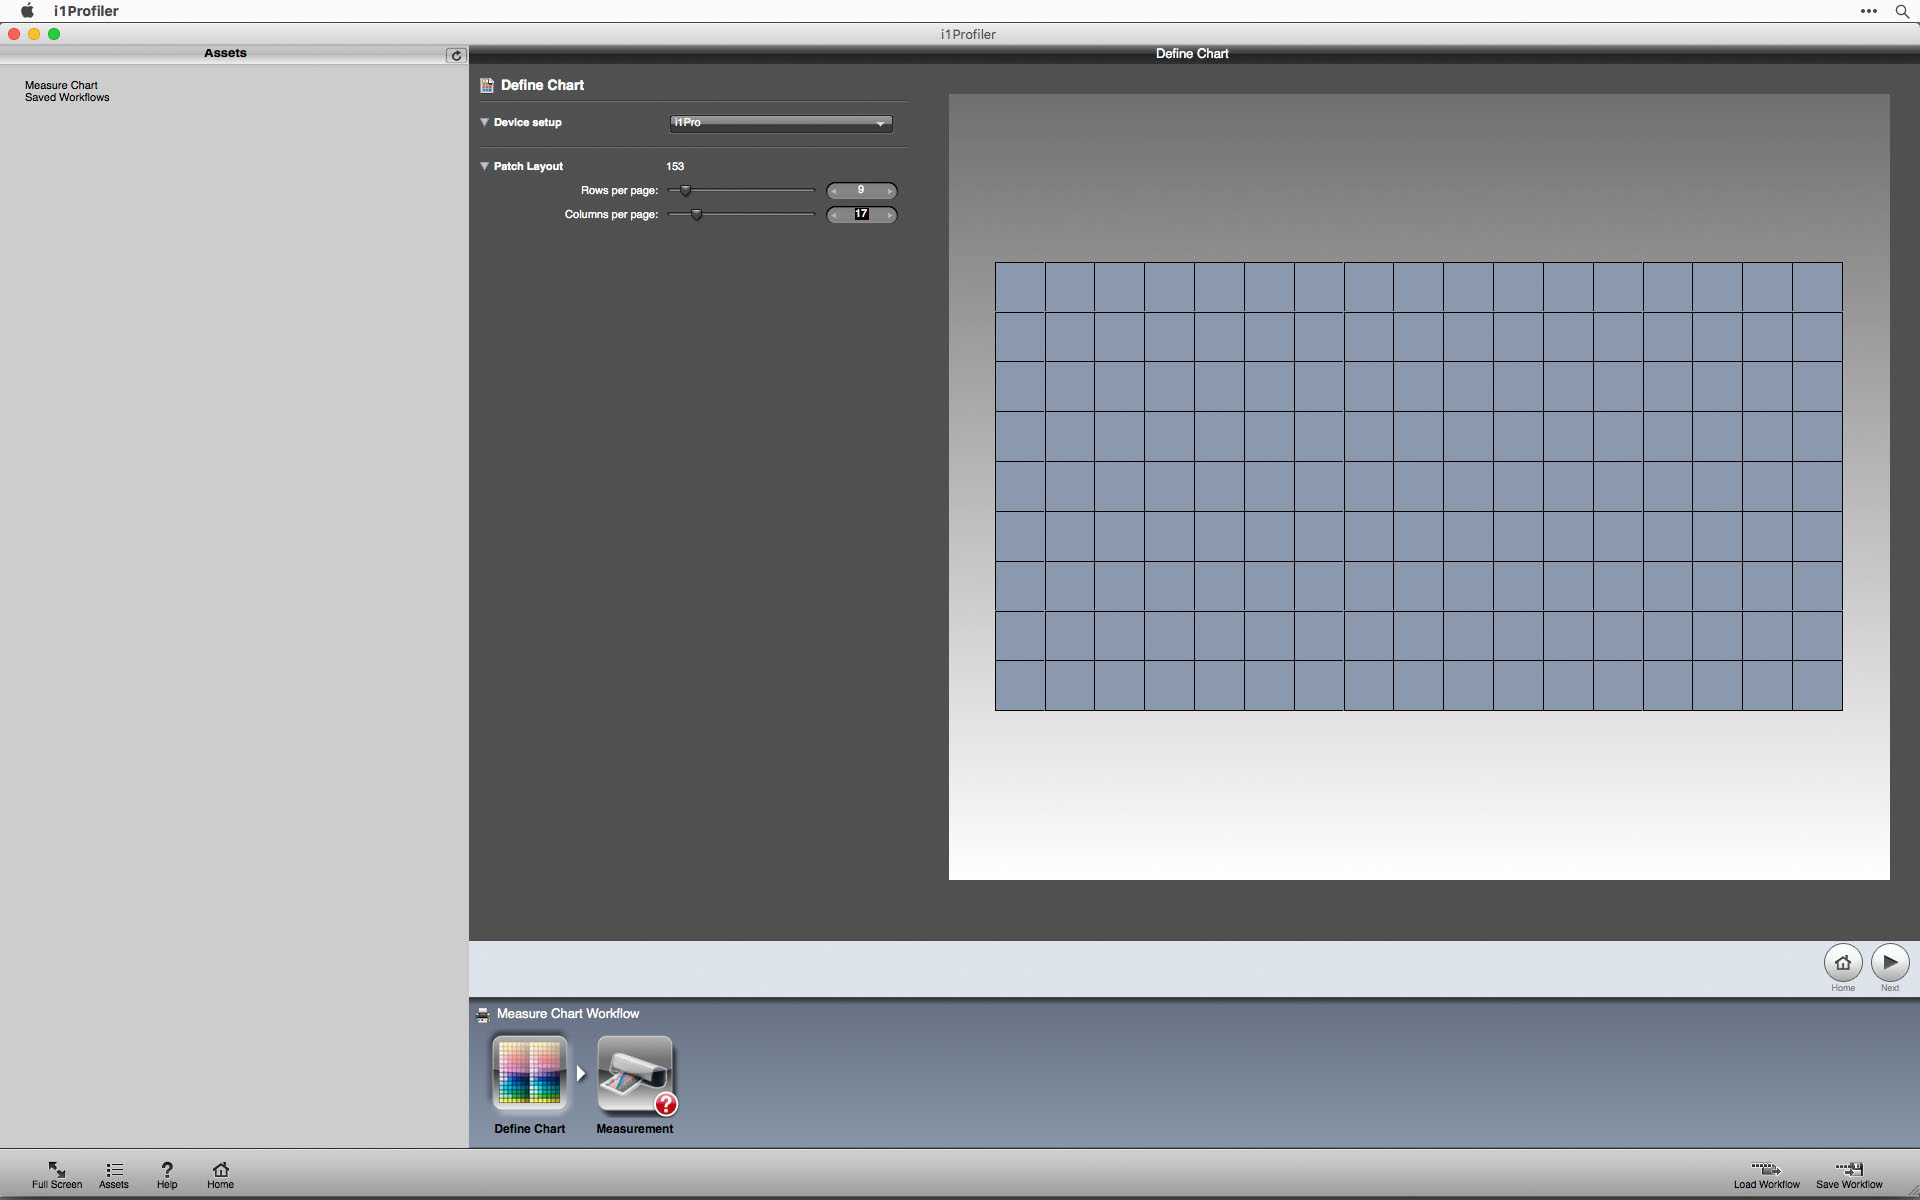 51x3 i1Profiler patch layout.jpg